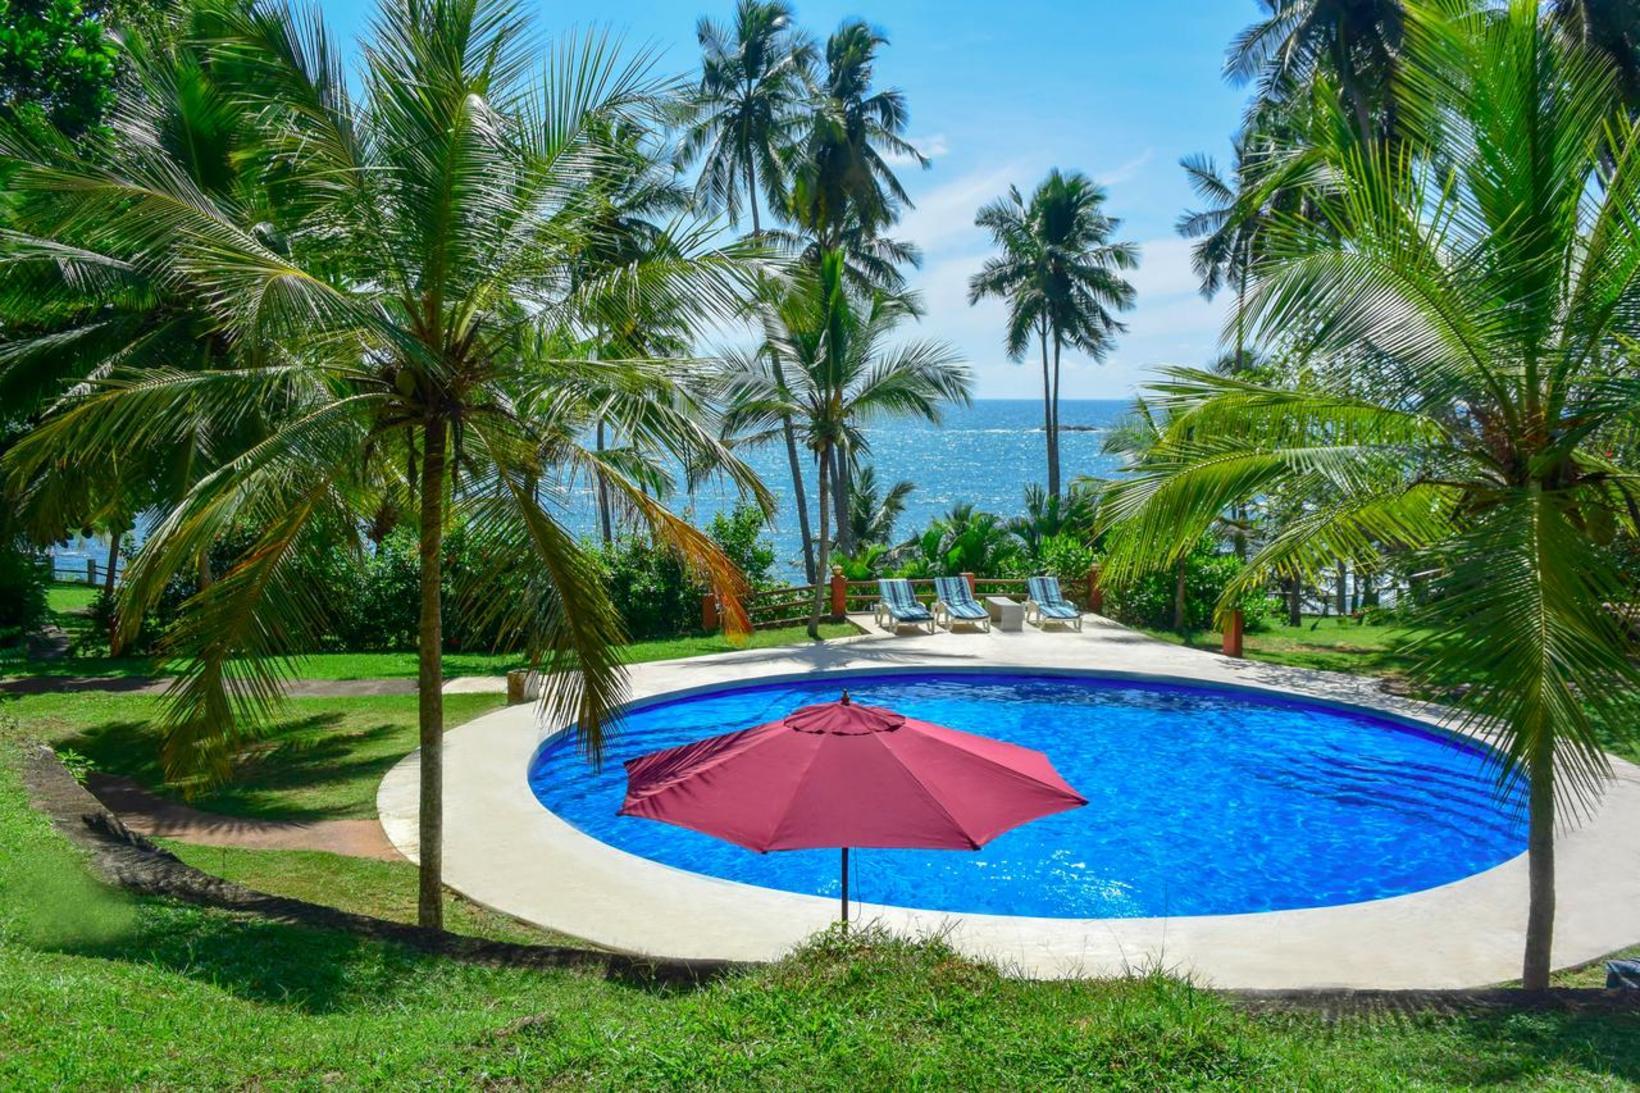 Hotel Eva Lanka, Tangalle